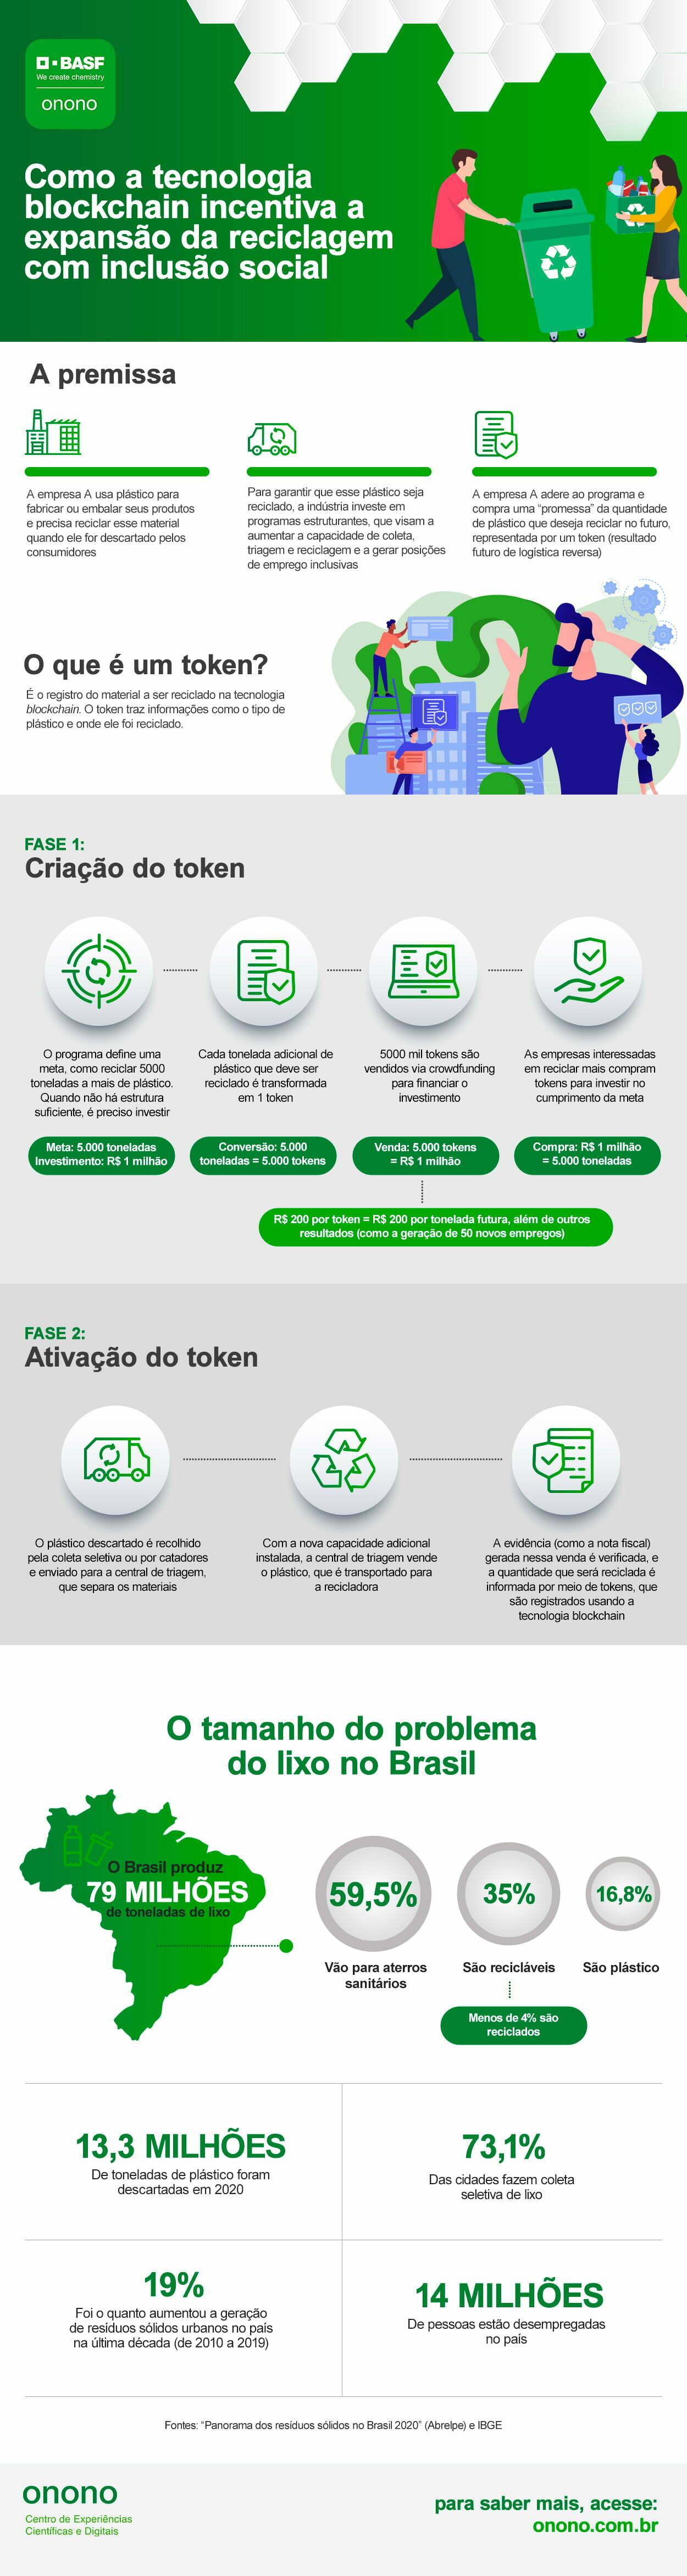 Infográfico onono Blockchain Recicláveis